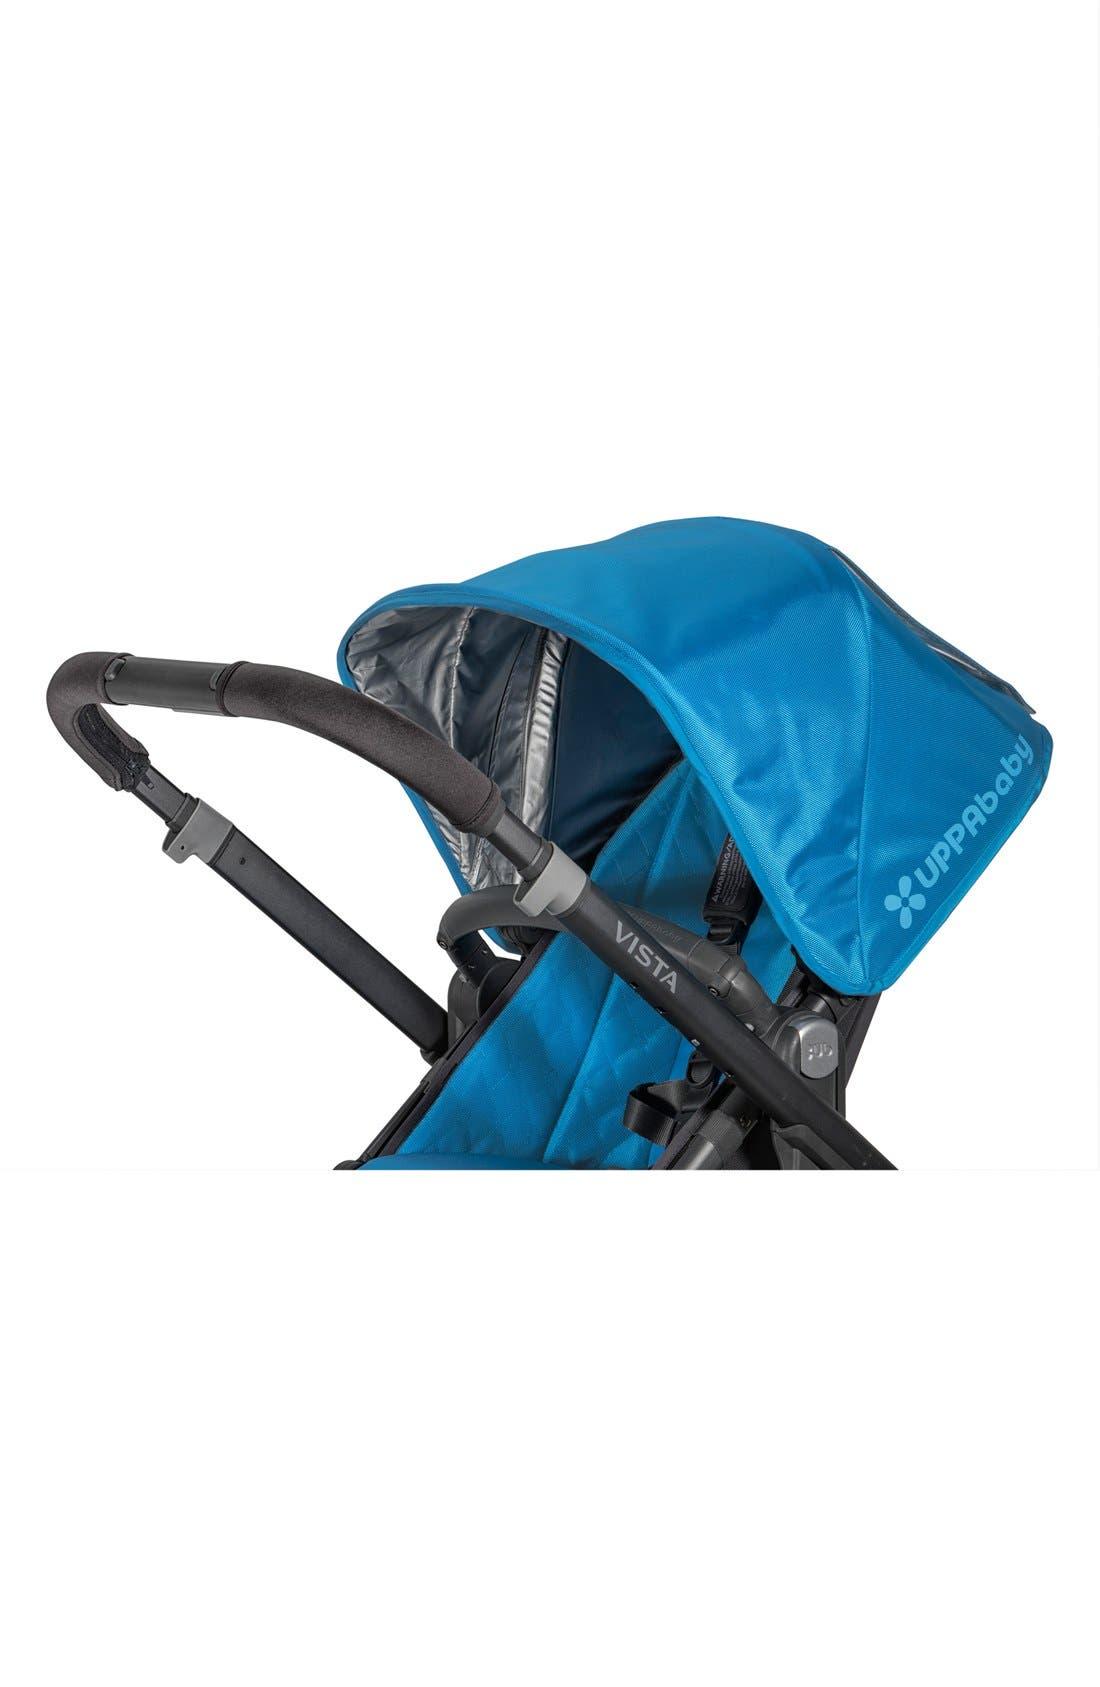 Alternate Image 1 Selected - UPPAbaby VISTA® Stroller Handlebar Cover